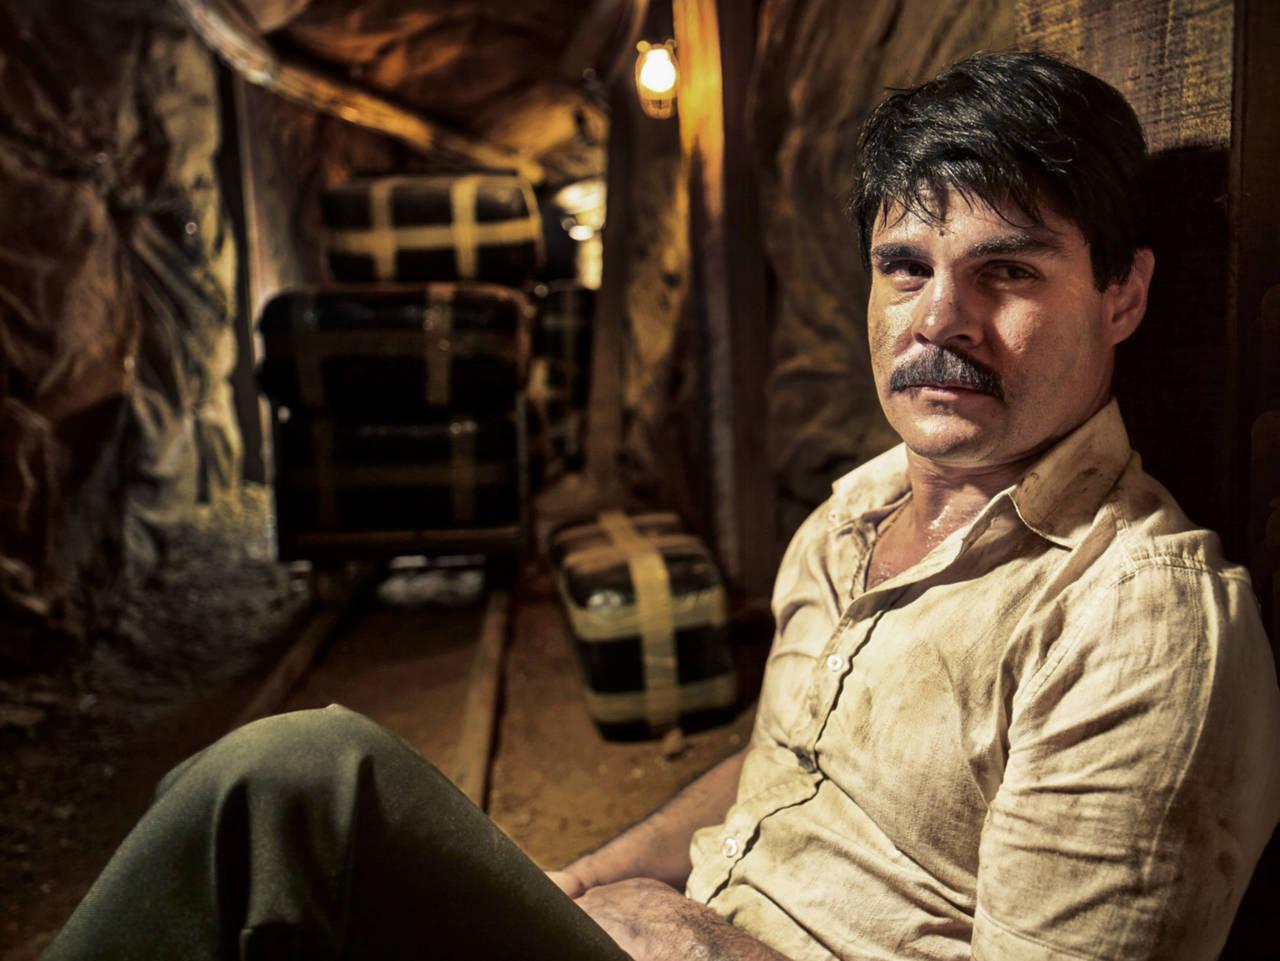 El Chapo: trial of Mexican cartel boss begins in New York